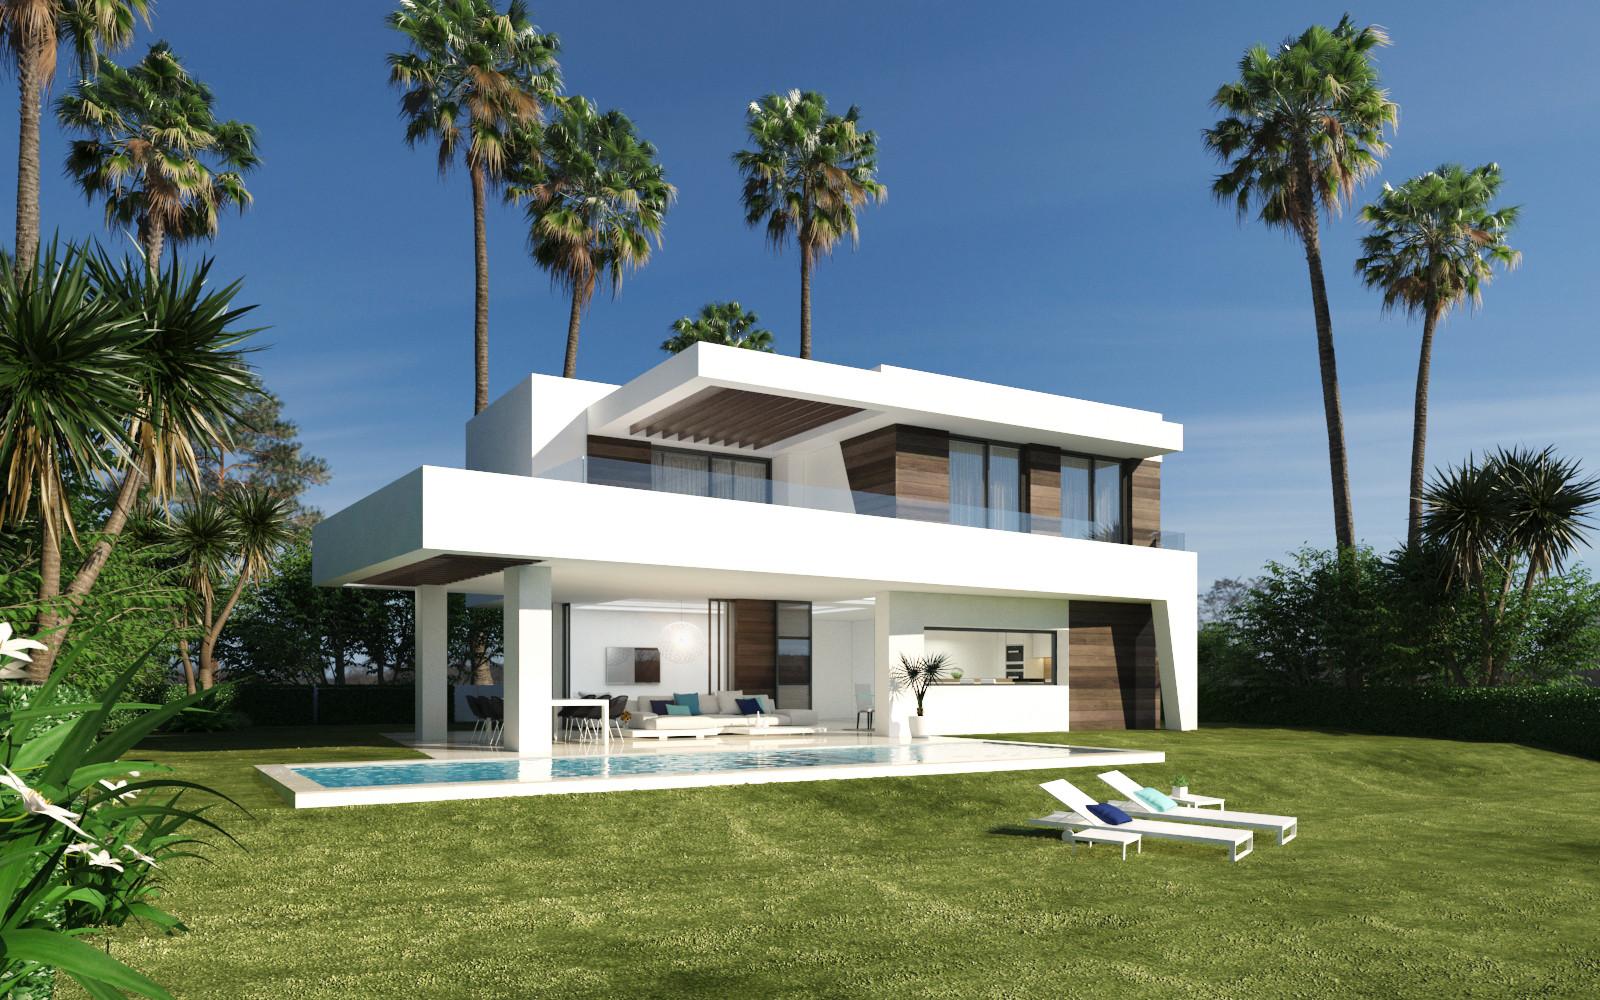 Image Property e1fb3cc1-91bb-4074-8180-67cf259866e9.jpg